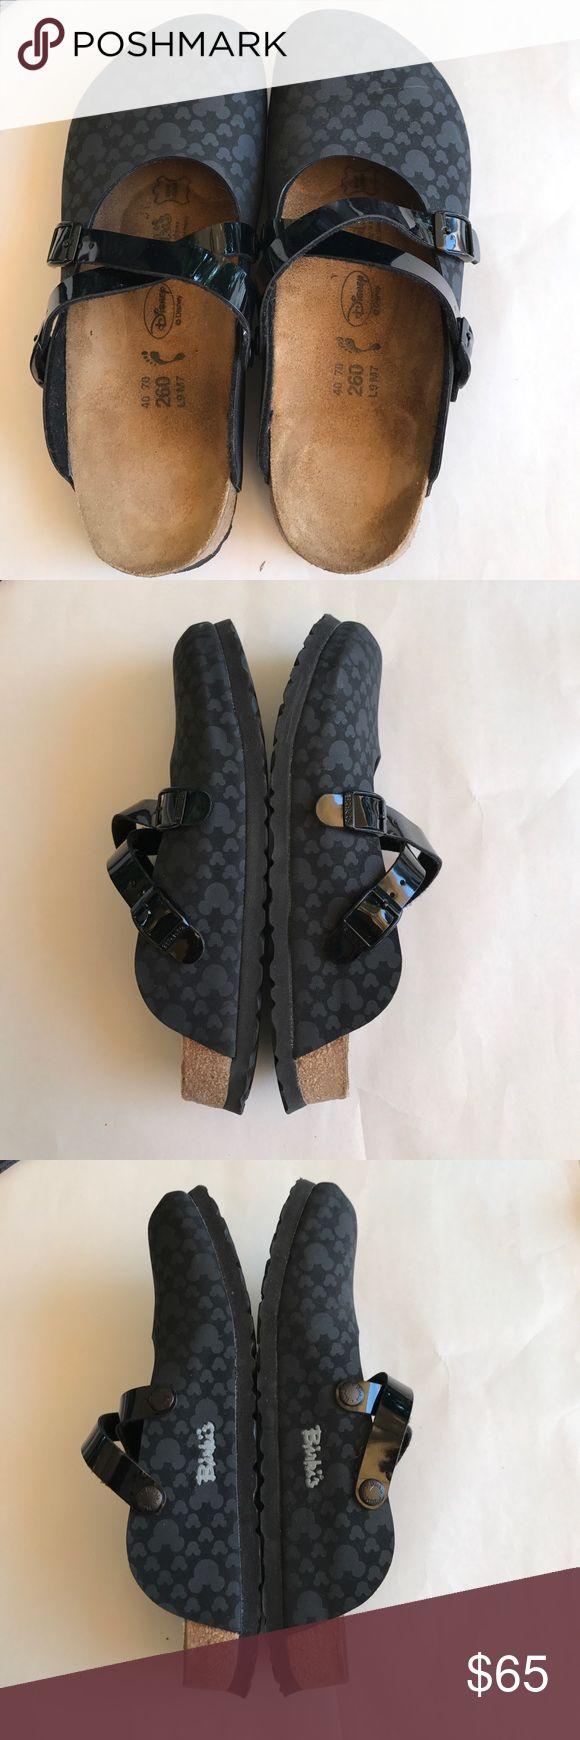 "Birkenstock ""Birki's"", Dorian style, Disney theme Birkenstock, ""Birki's"", Dorian style Clog, black Mickey Mouse Design. Ladies size 9, men's size 7. Birkenstock Shoes Mules & Clogs"